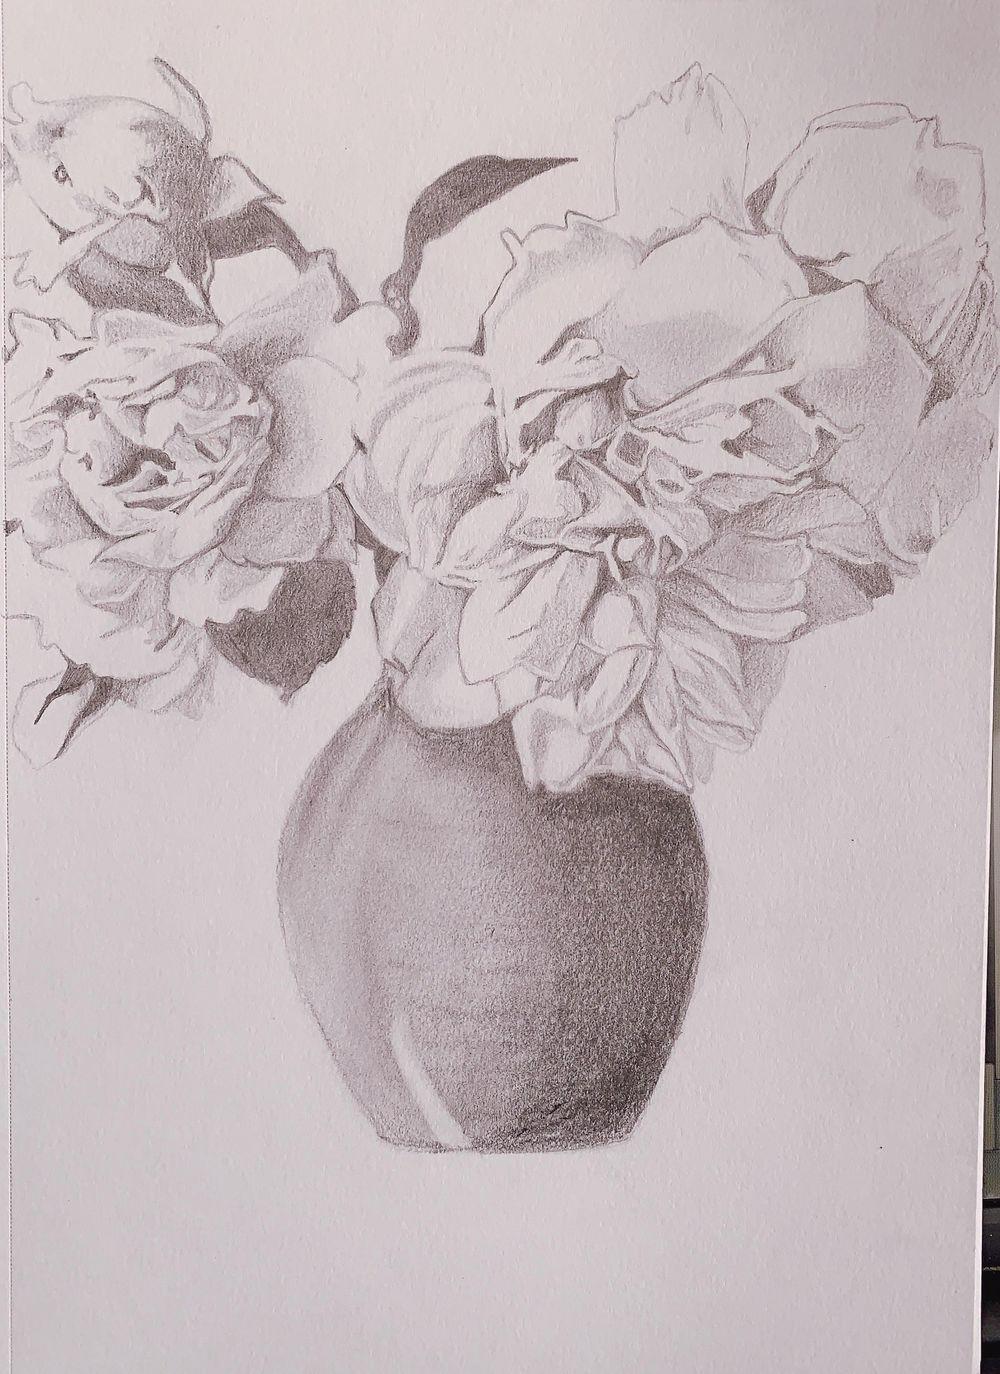 Flower vase - image 1 - student project